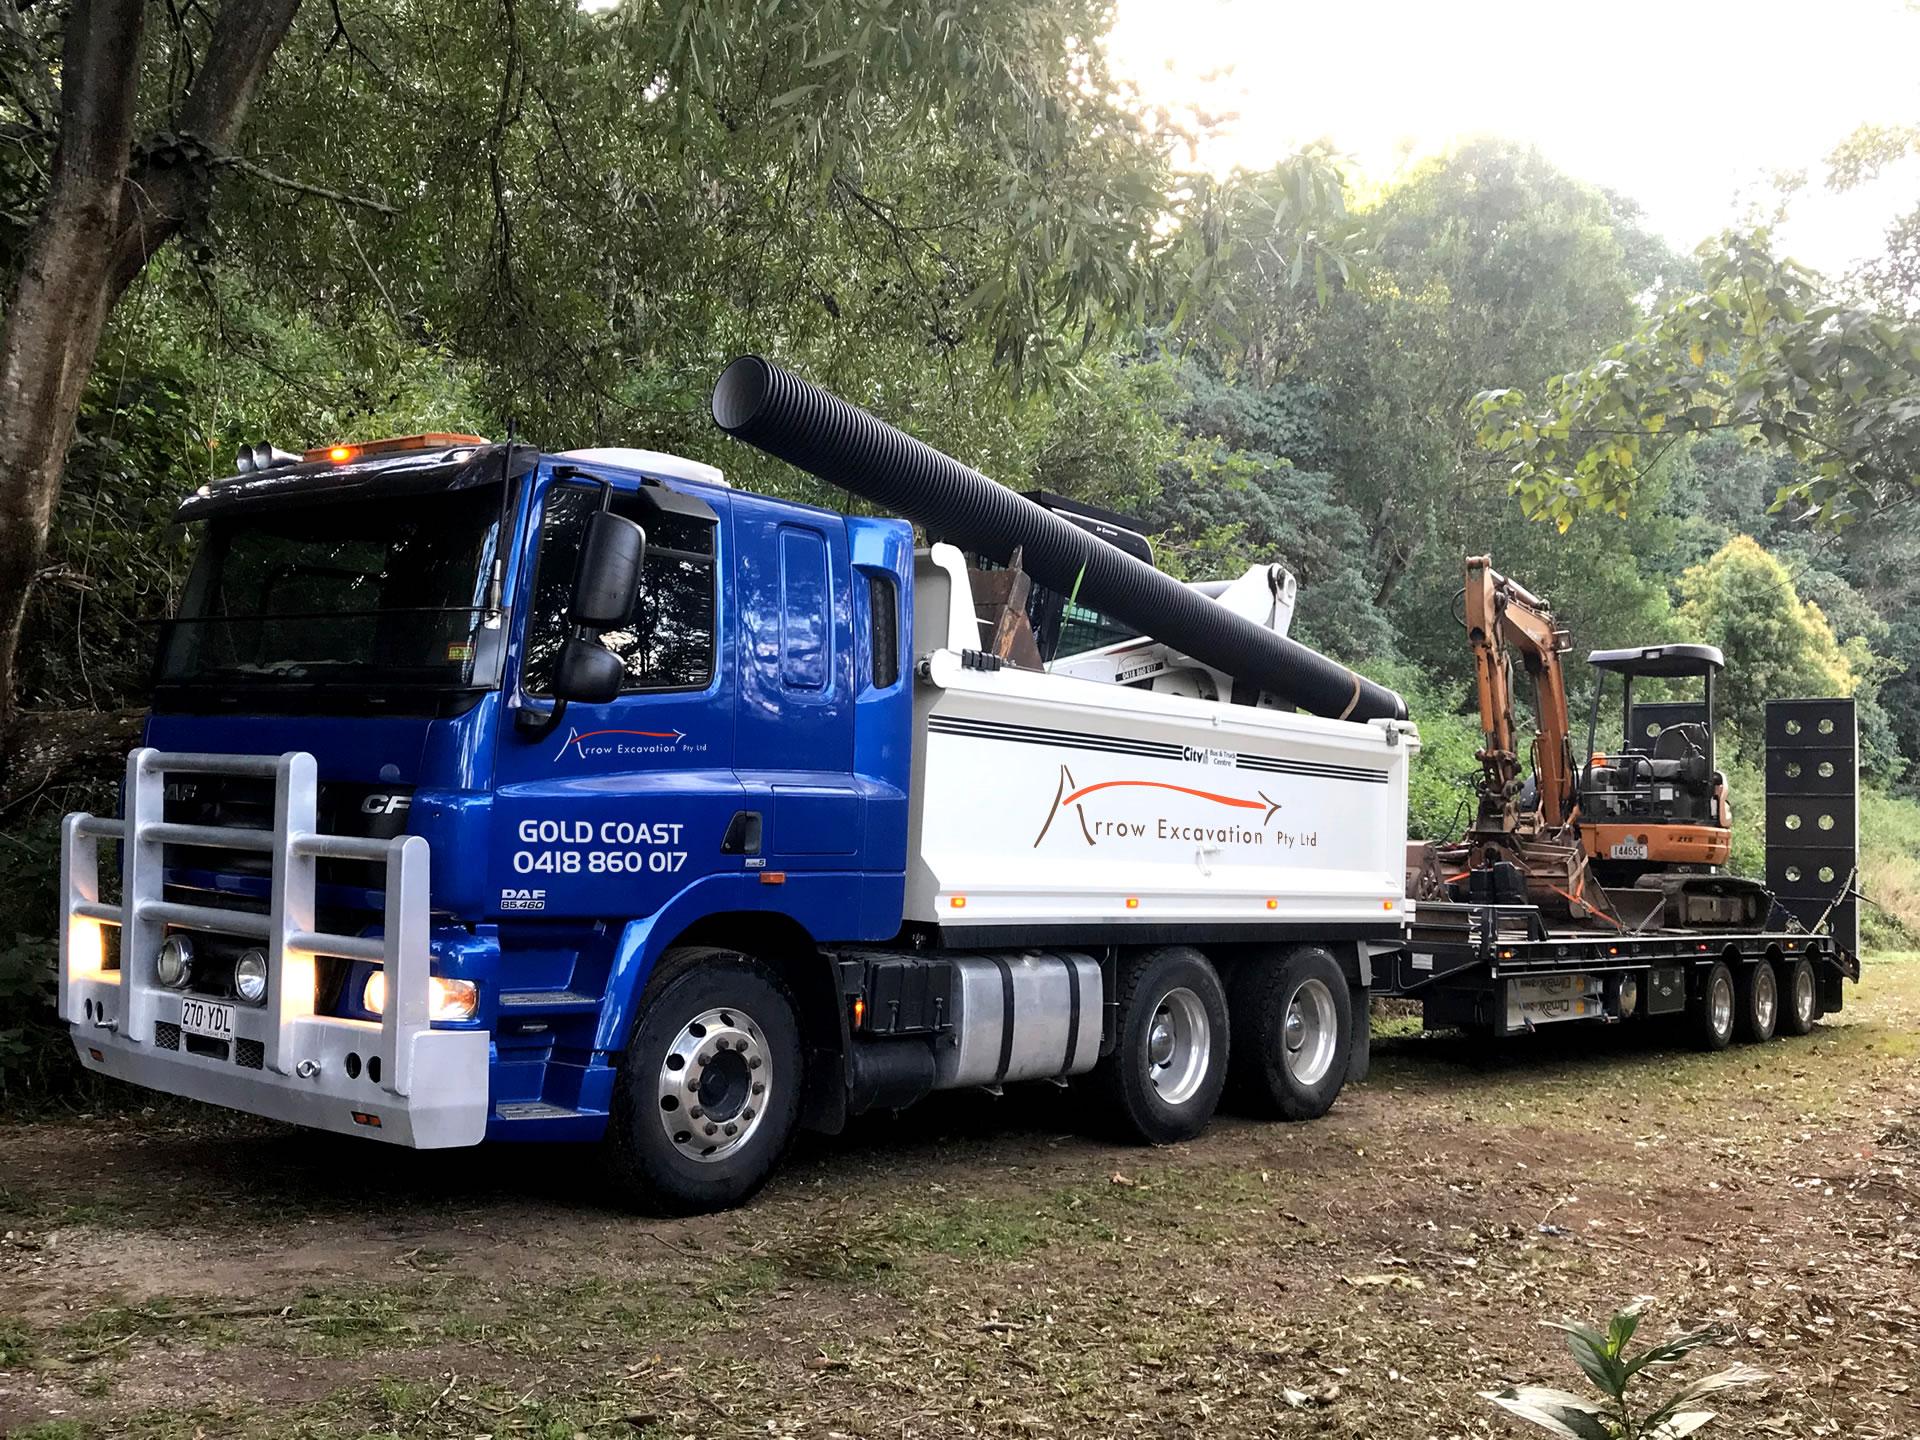 Arrow Excavation Excavator Bobcat Truck Combo Hire Gold Coast Brisbane